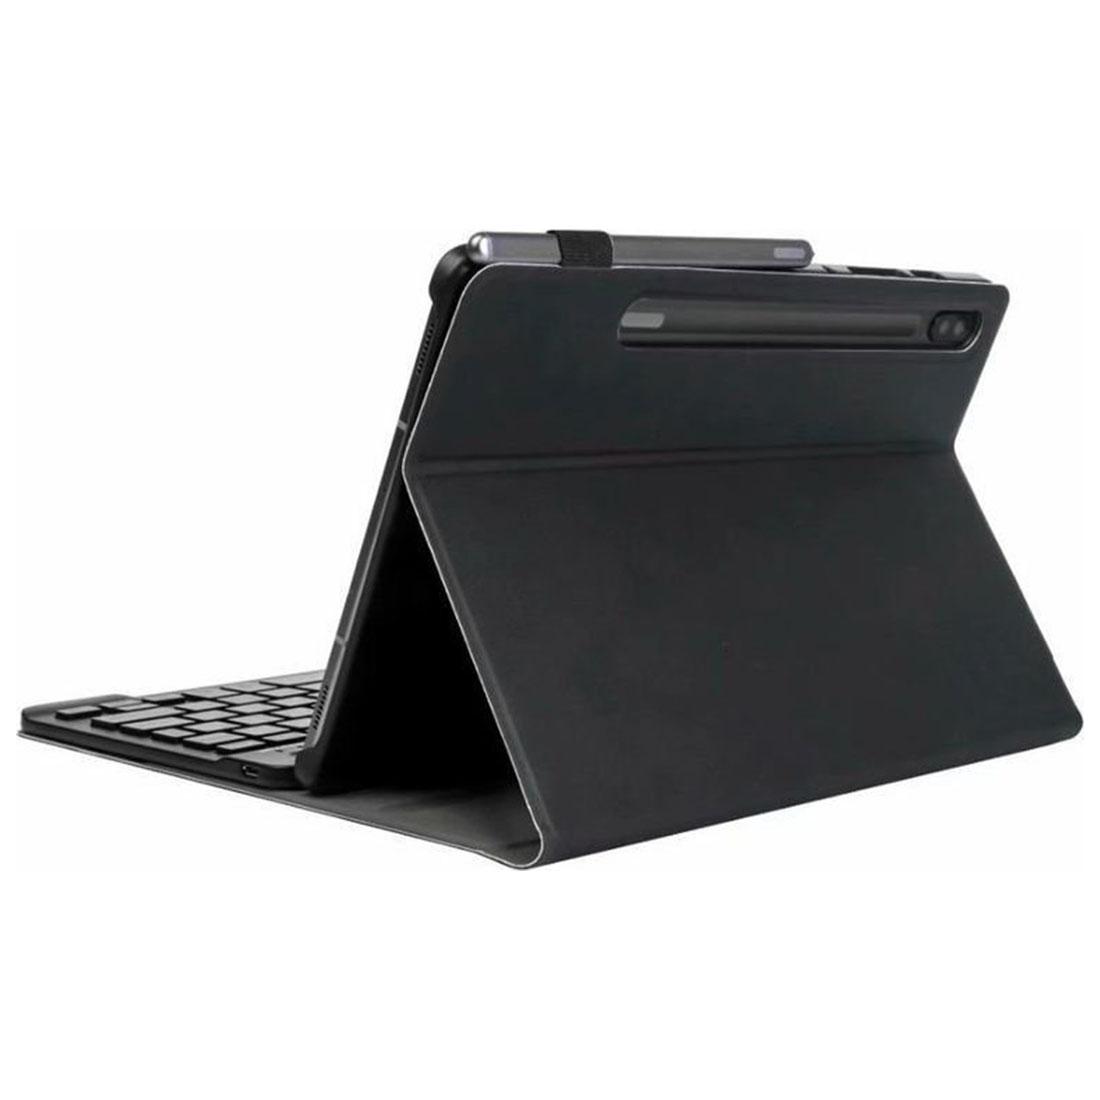 Capa Teclado Samsung Galaxy Tab S6 10.5 Pol T860 T865  - HARS